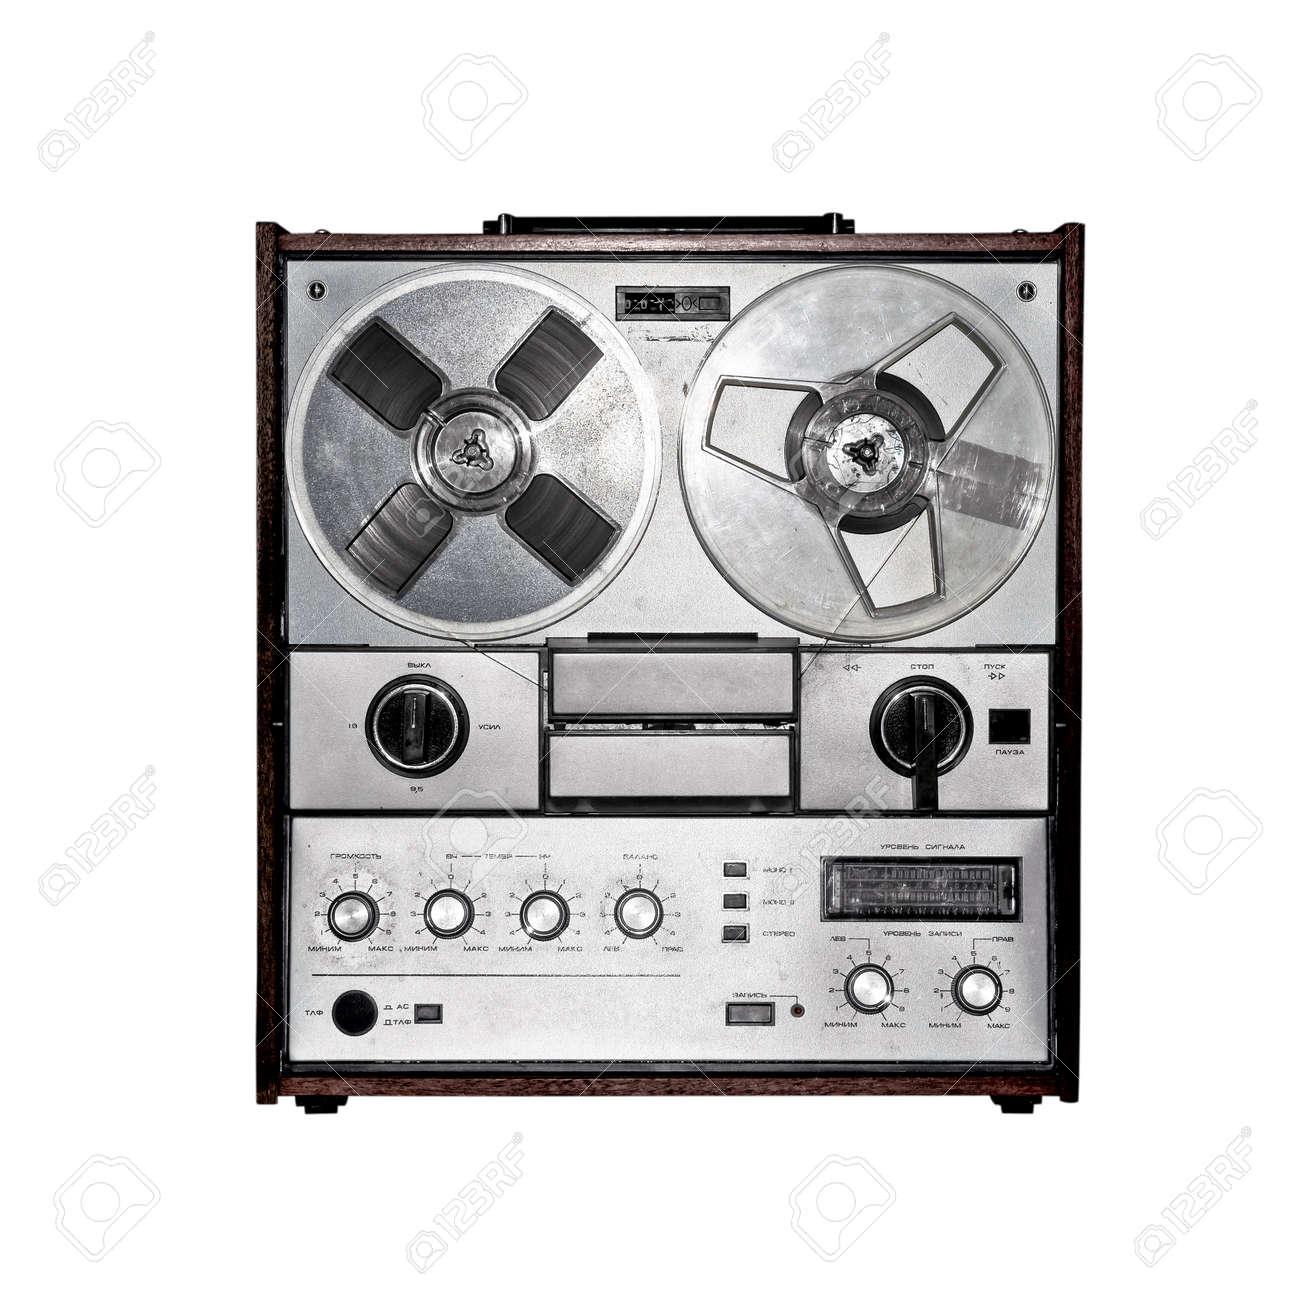 Retro audio tape recorder Isolated on white - 24639633